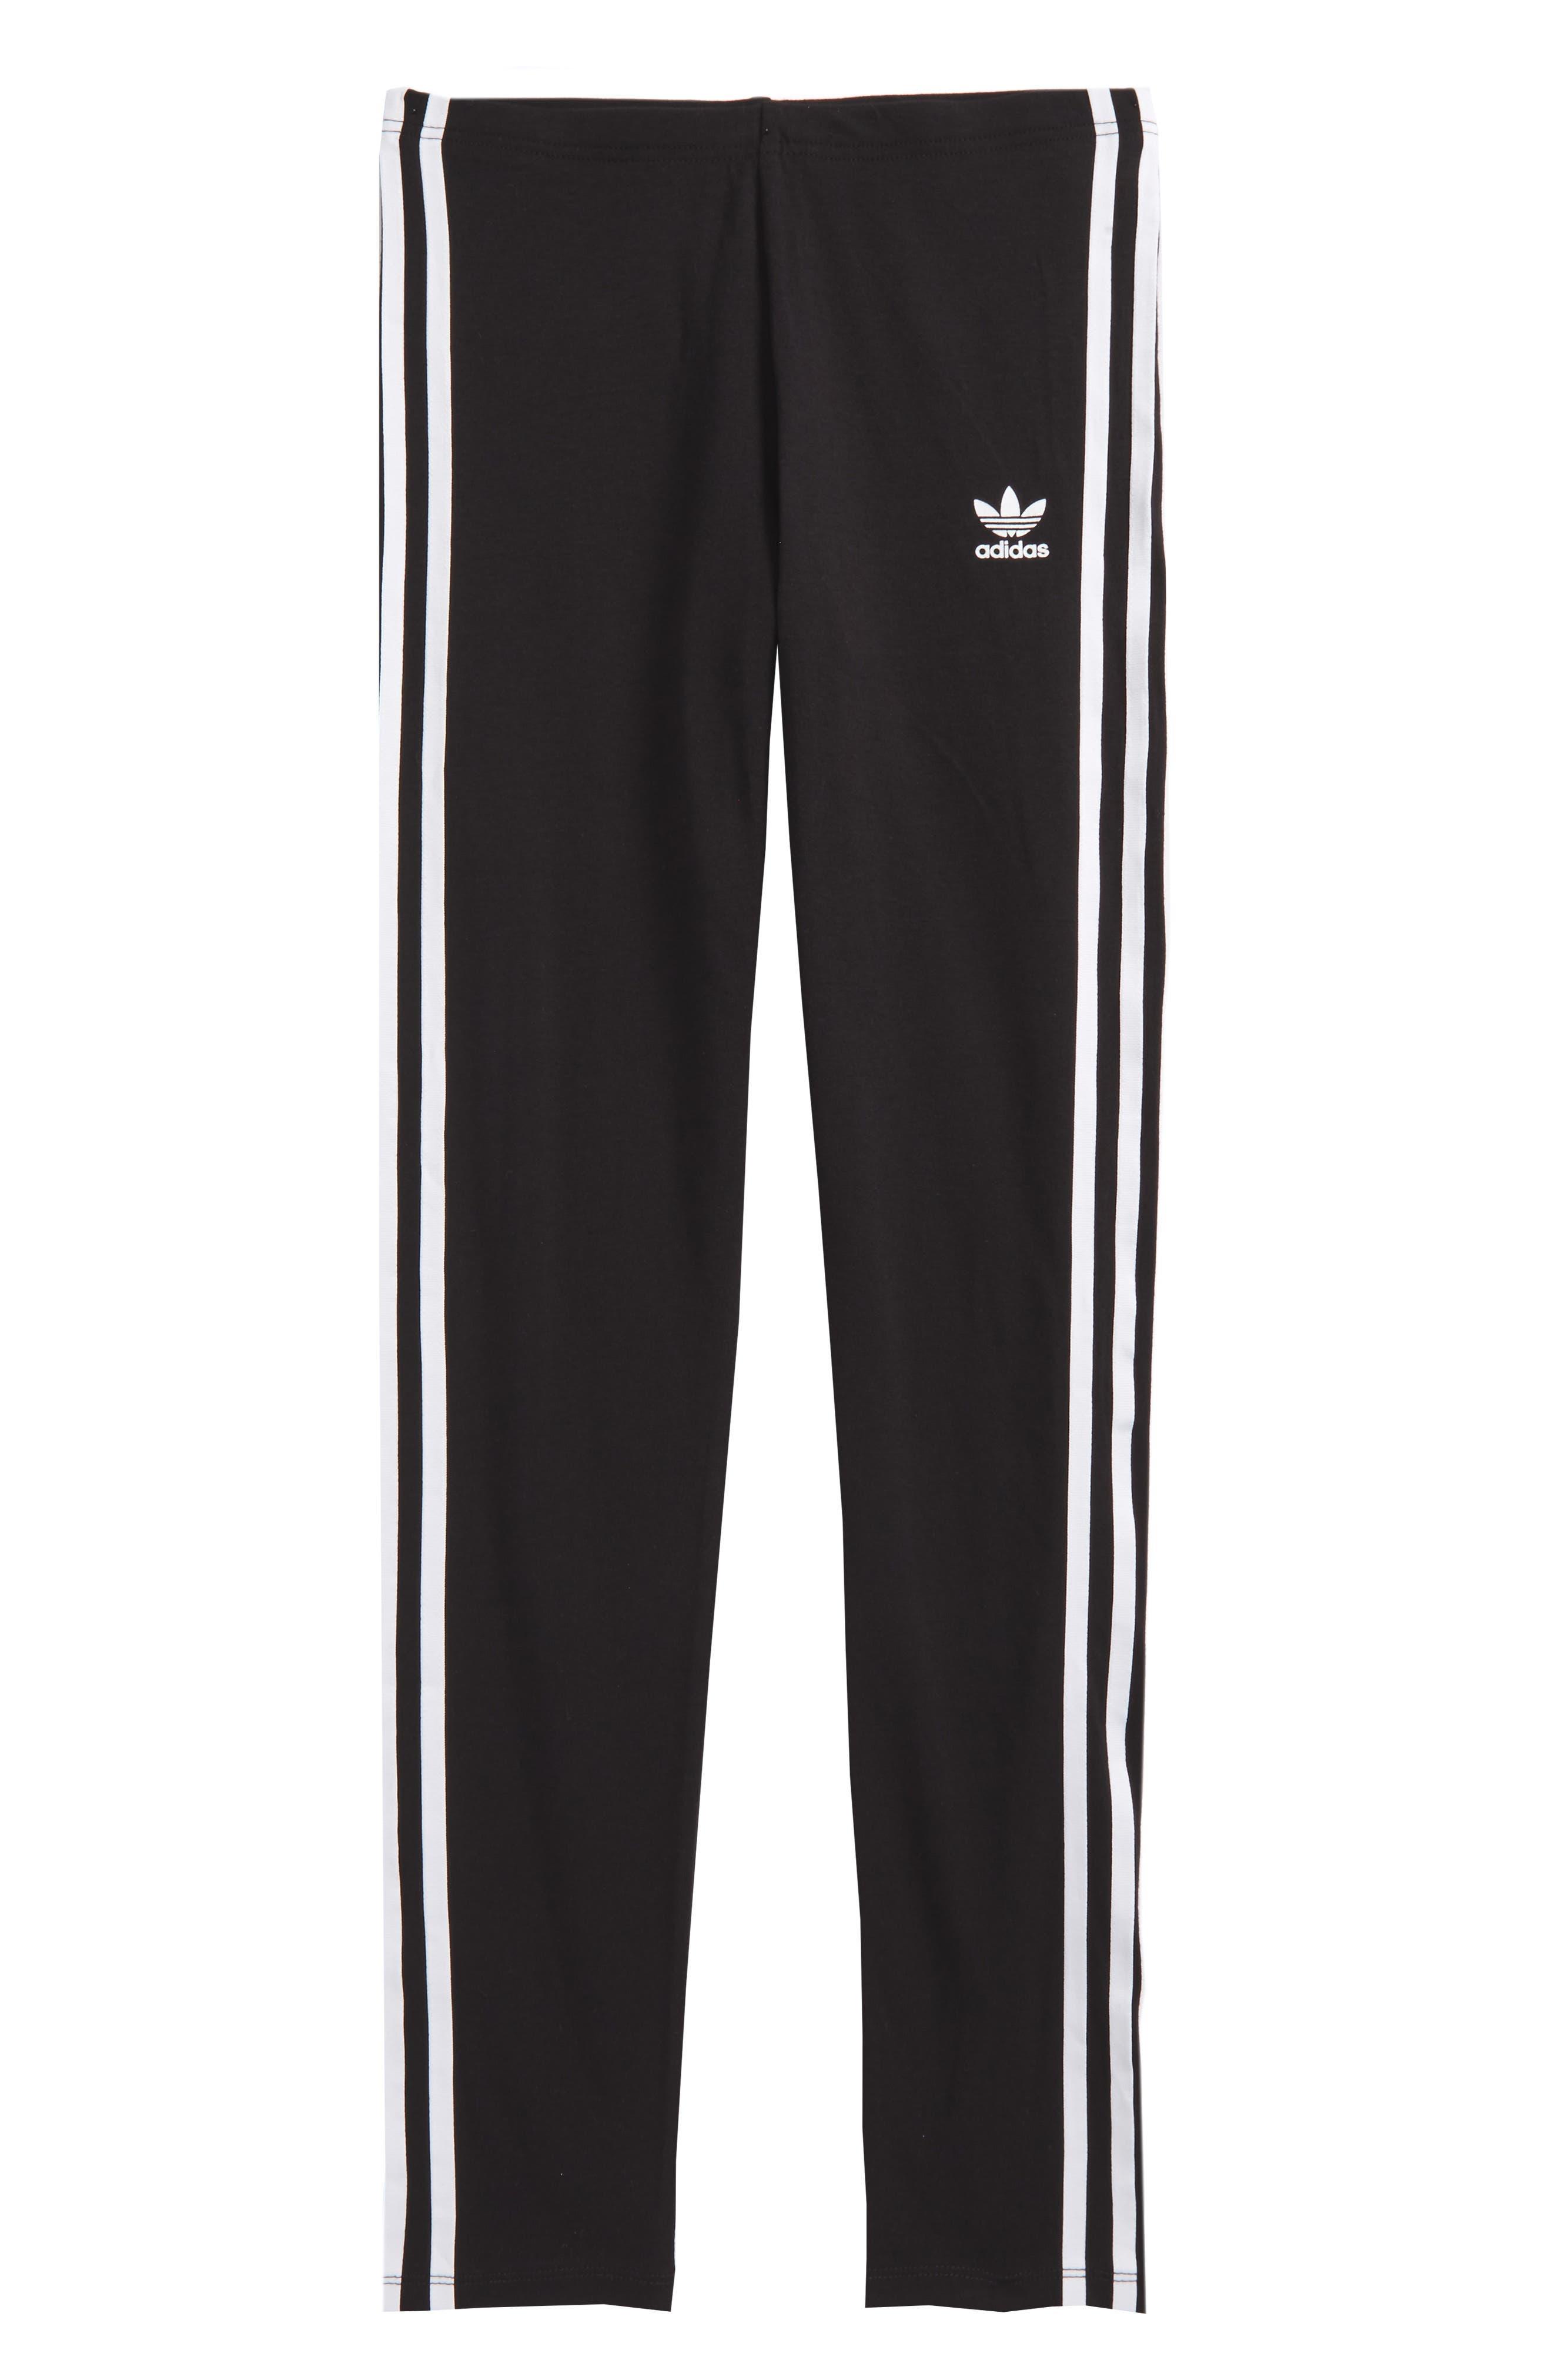 ADIDAS ORIGINALS, adidas 3-Stripes Leggings, Main thumbnail 1, color, BLACK/ WHITE